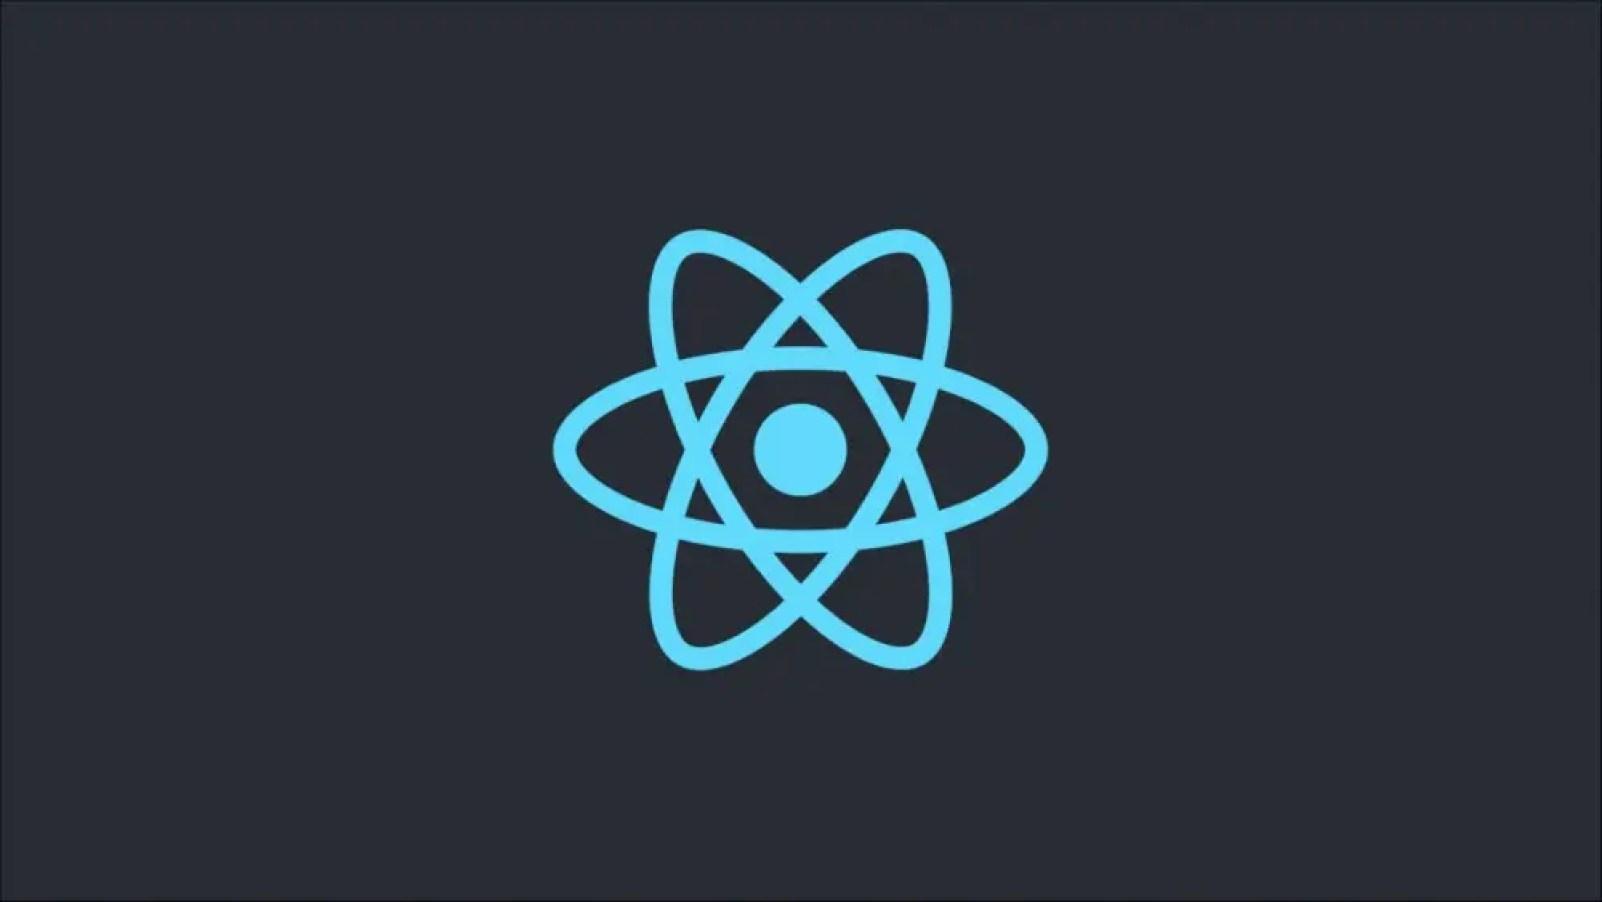 React logo on a dark background